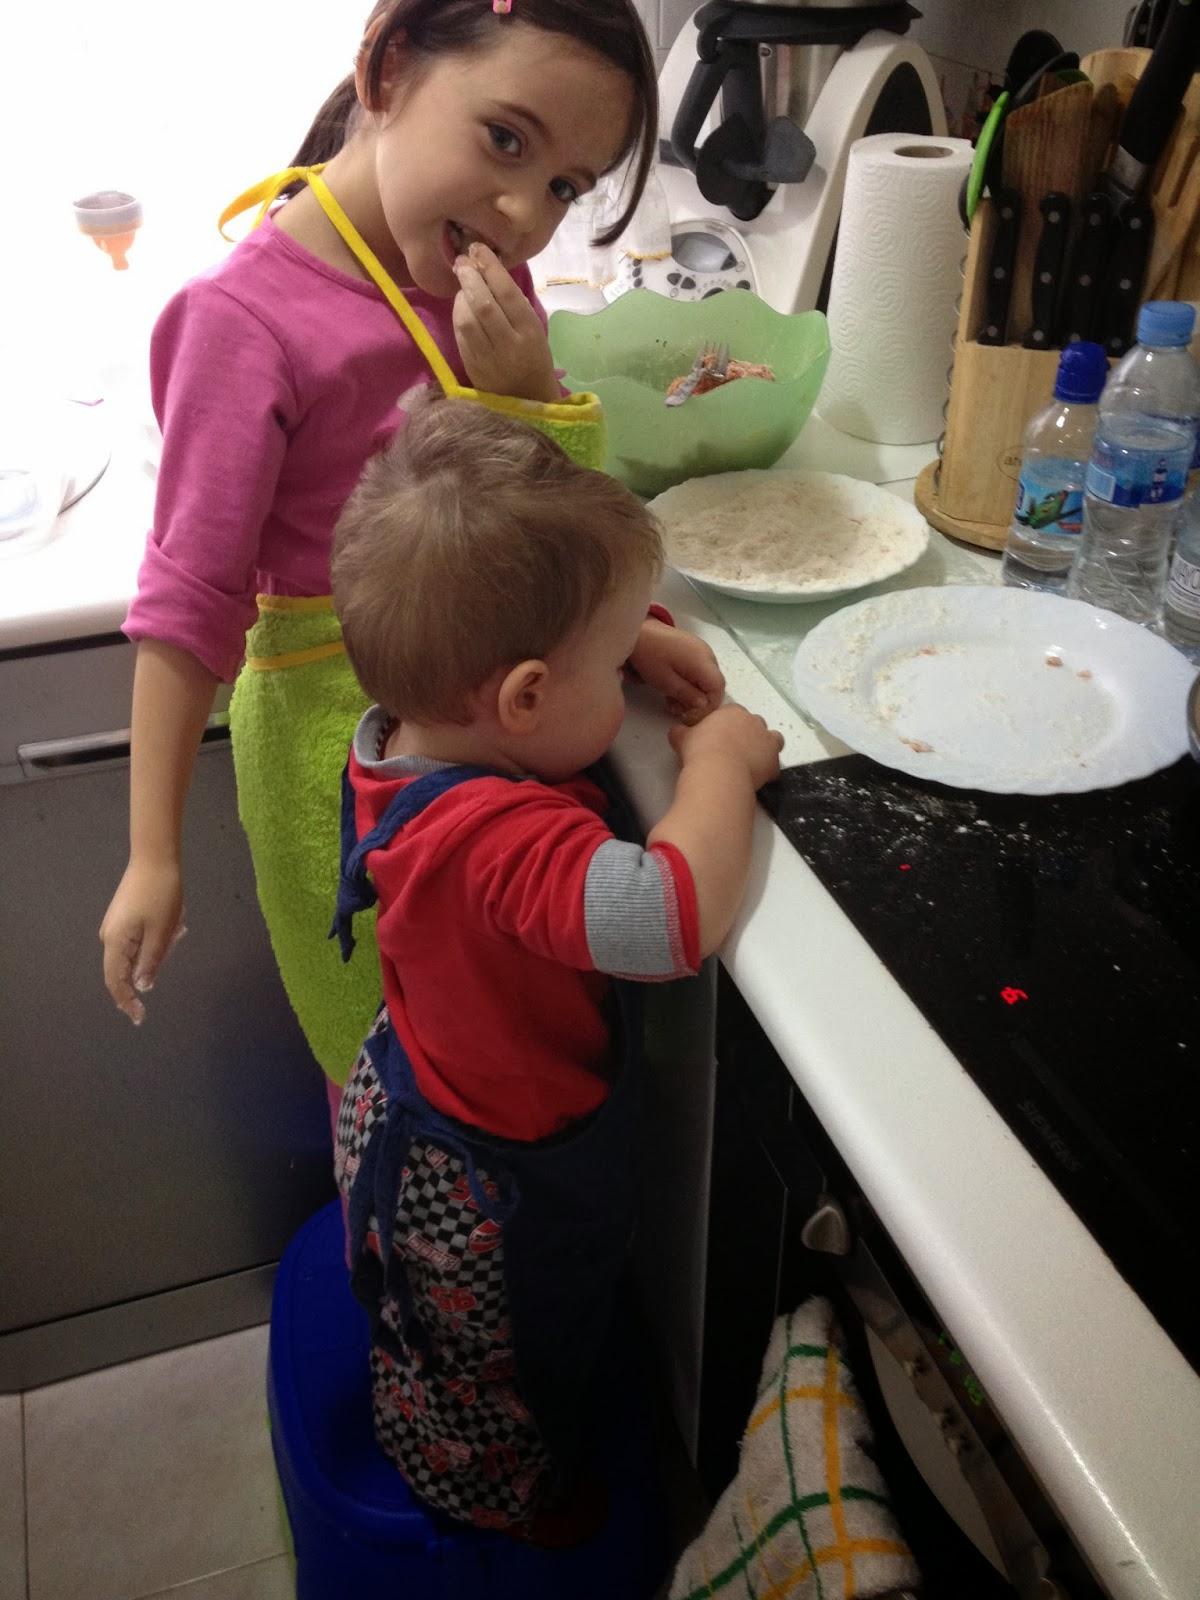 comida infantil,comida, niños, hijos